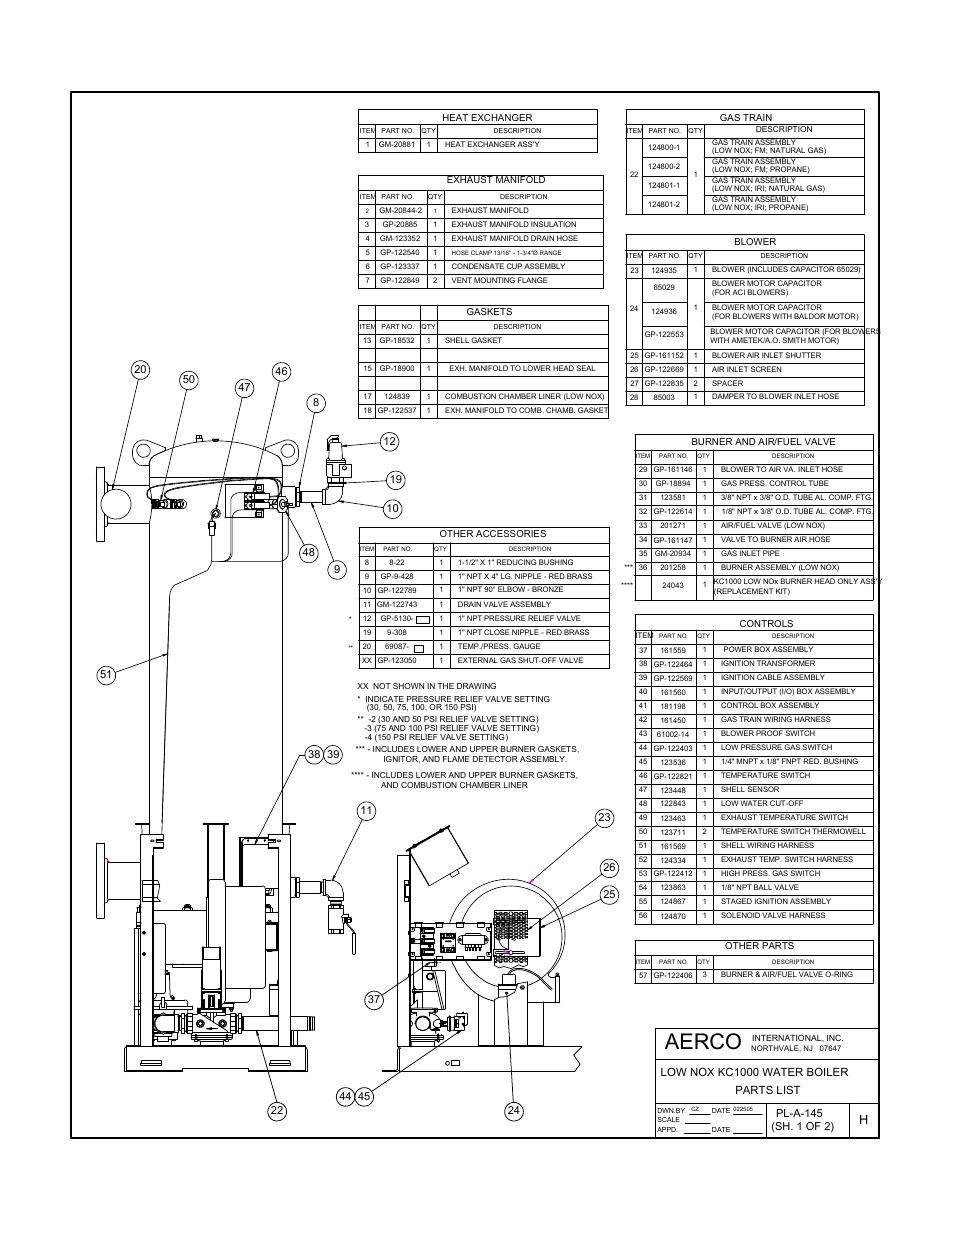 Appendix f, Aerco, Parts list low nox kc1000 water boiler